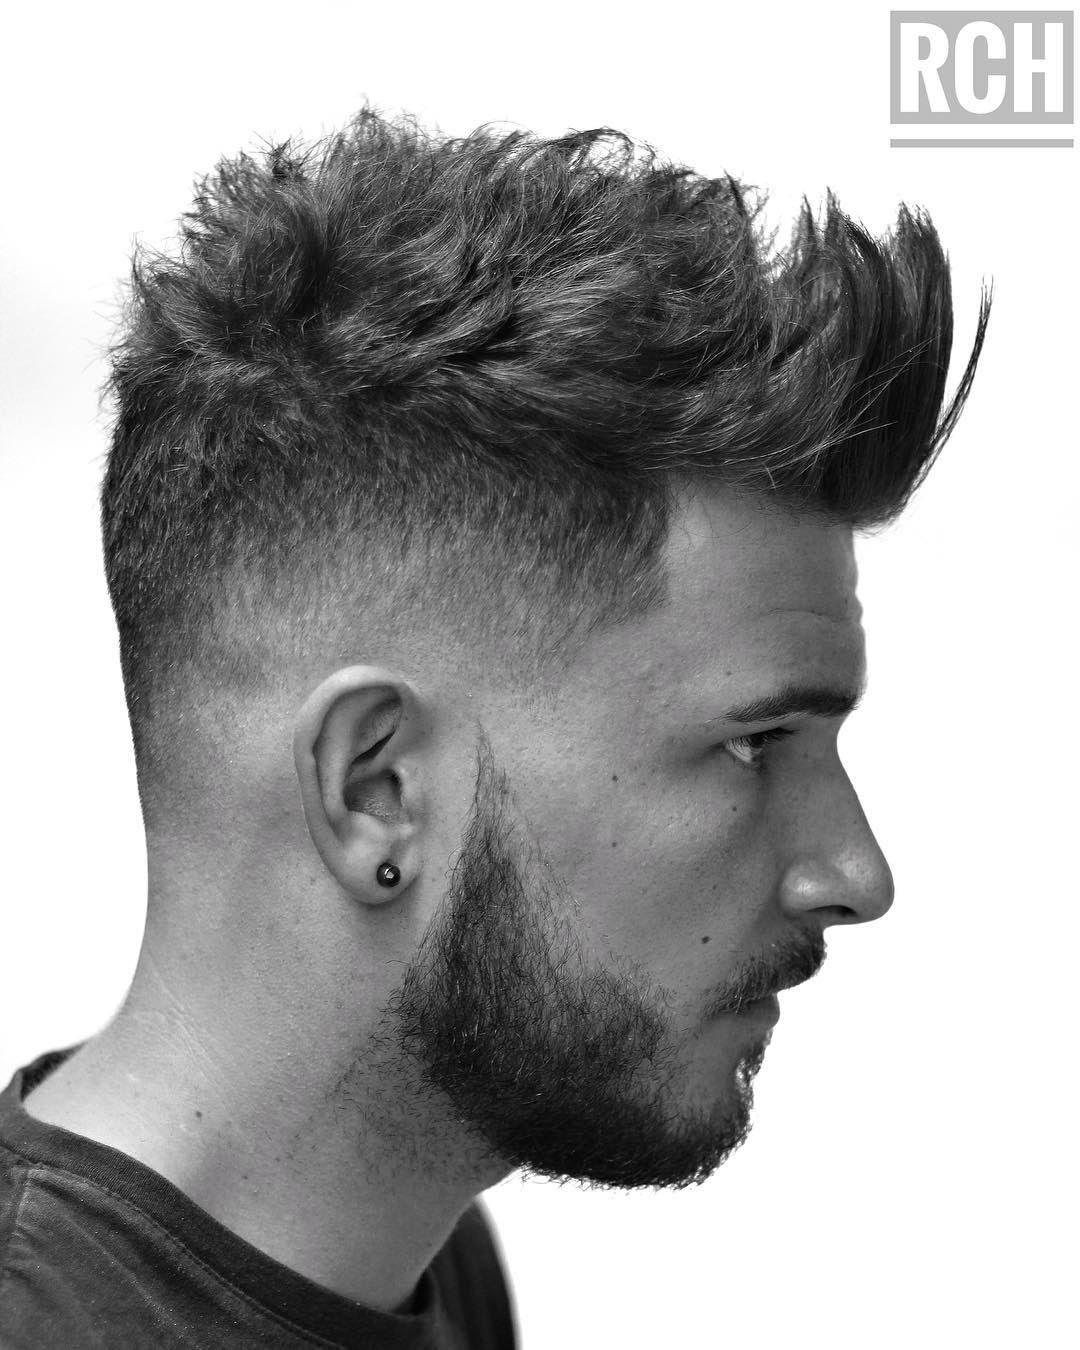 100+ New Men\'s Hairstyles (Top Picks) | Men\'s hairstyles | Haircuts ...